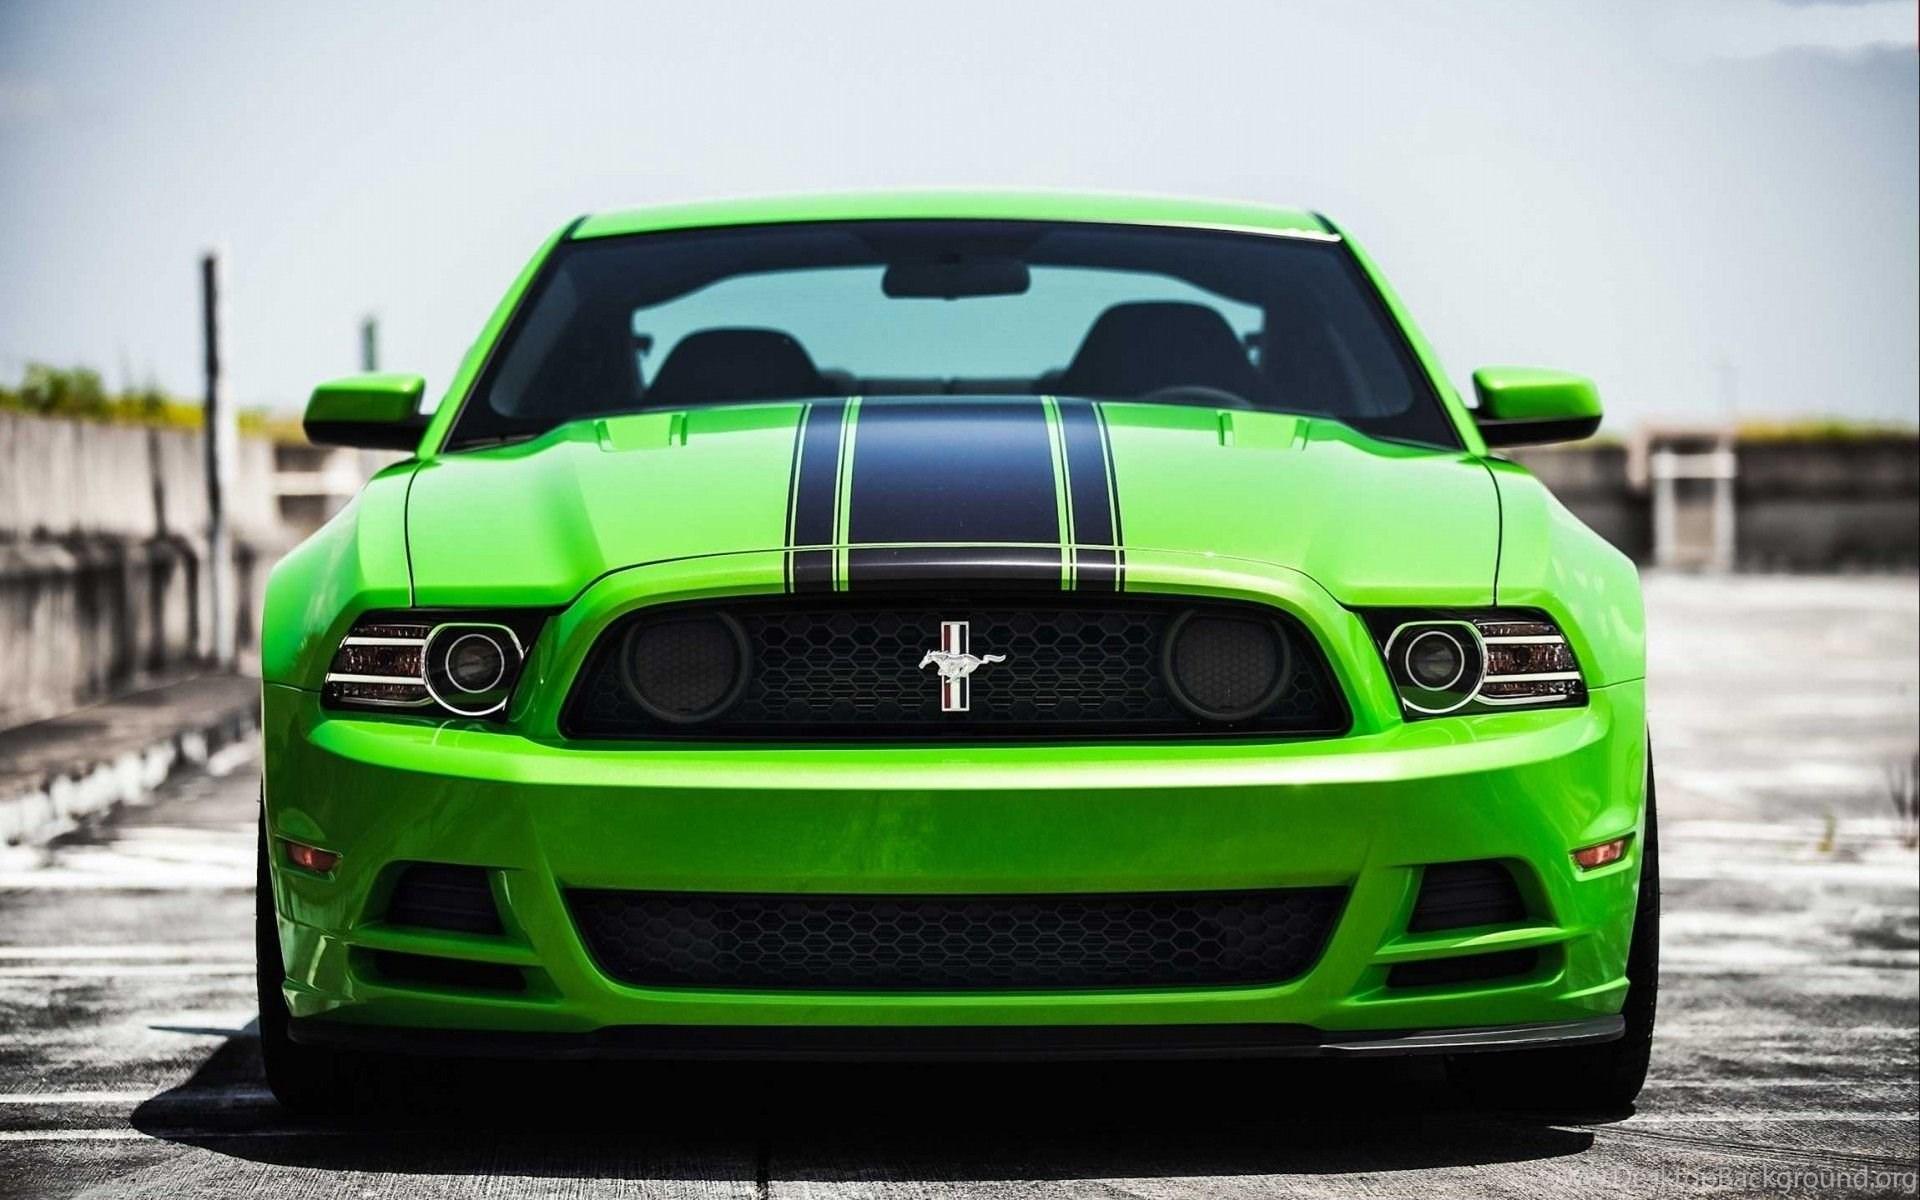 Ford Mustang Boss 302 Wallpapers 1167510 Desktop Background